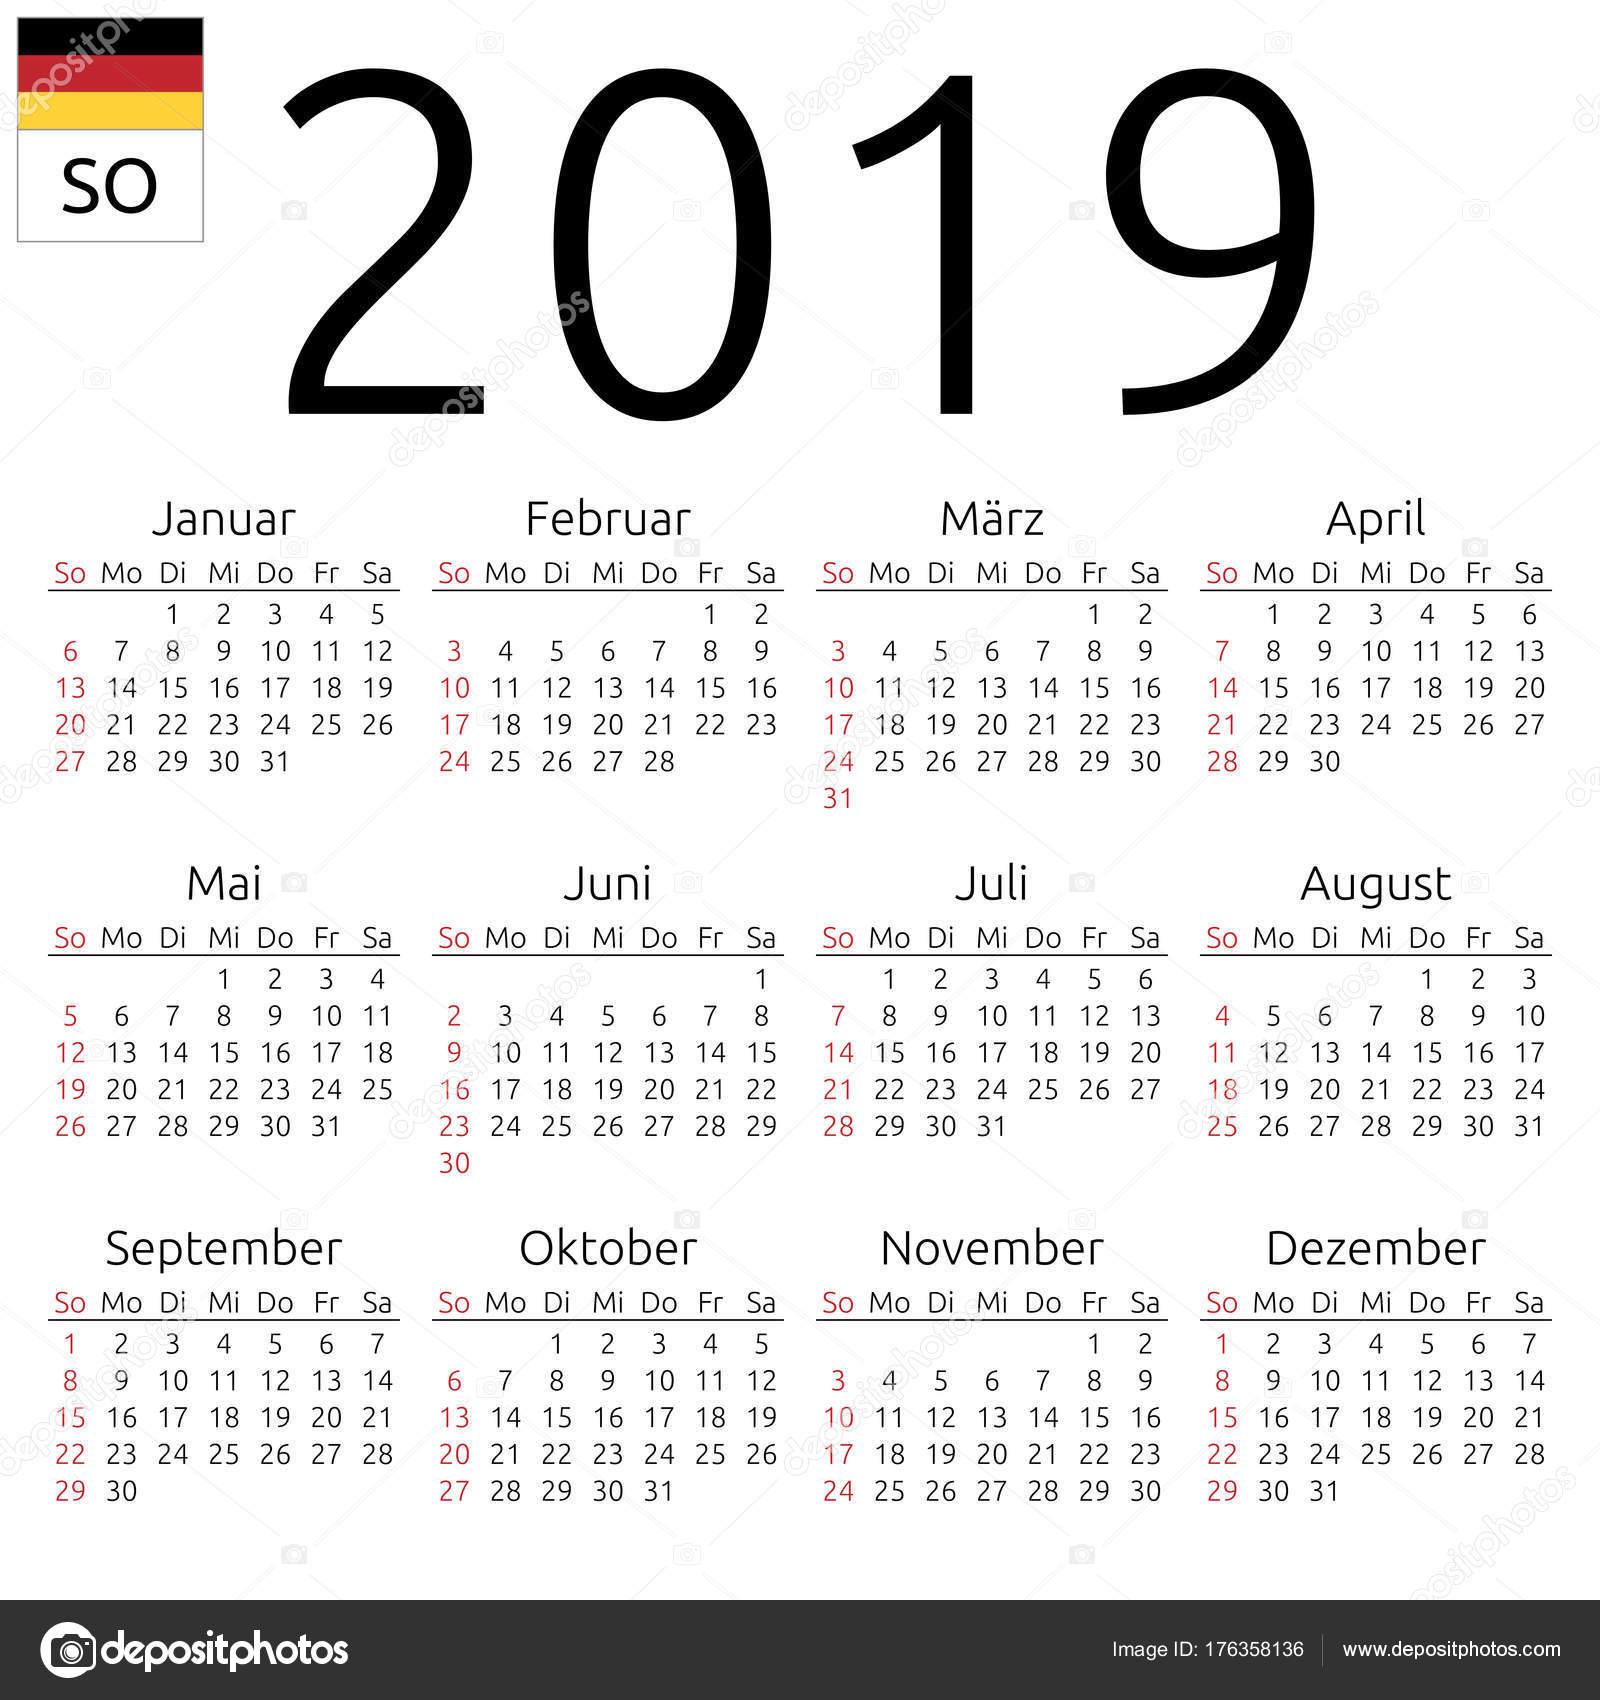 2019 Takvimi Kleobergdorfbibco